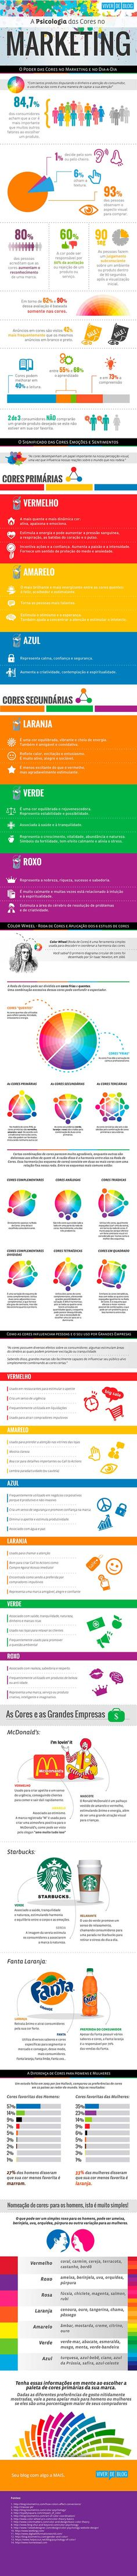 Infográfico: A Psicologia das Cores no Marketing